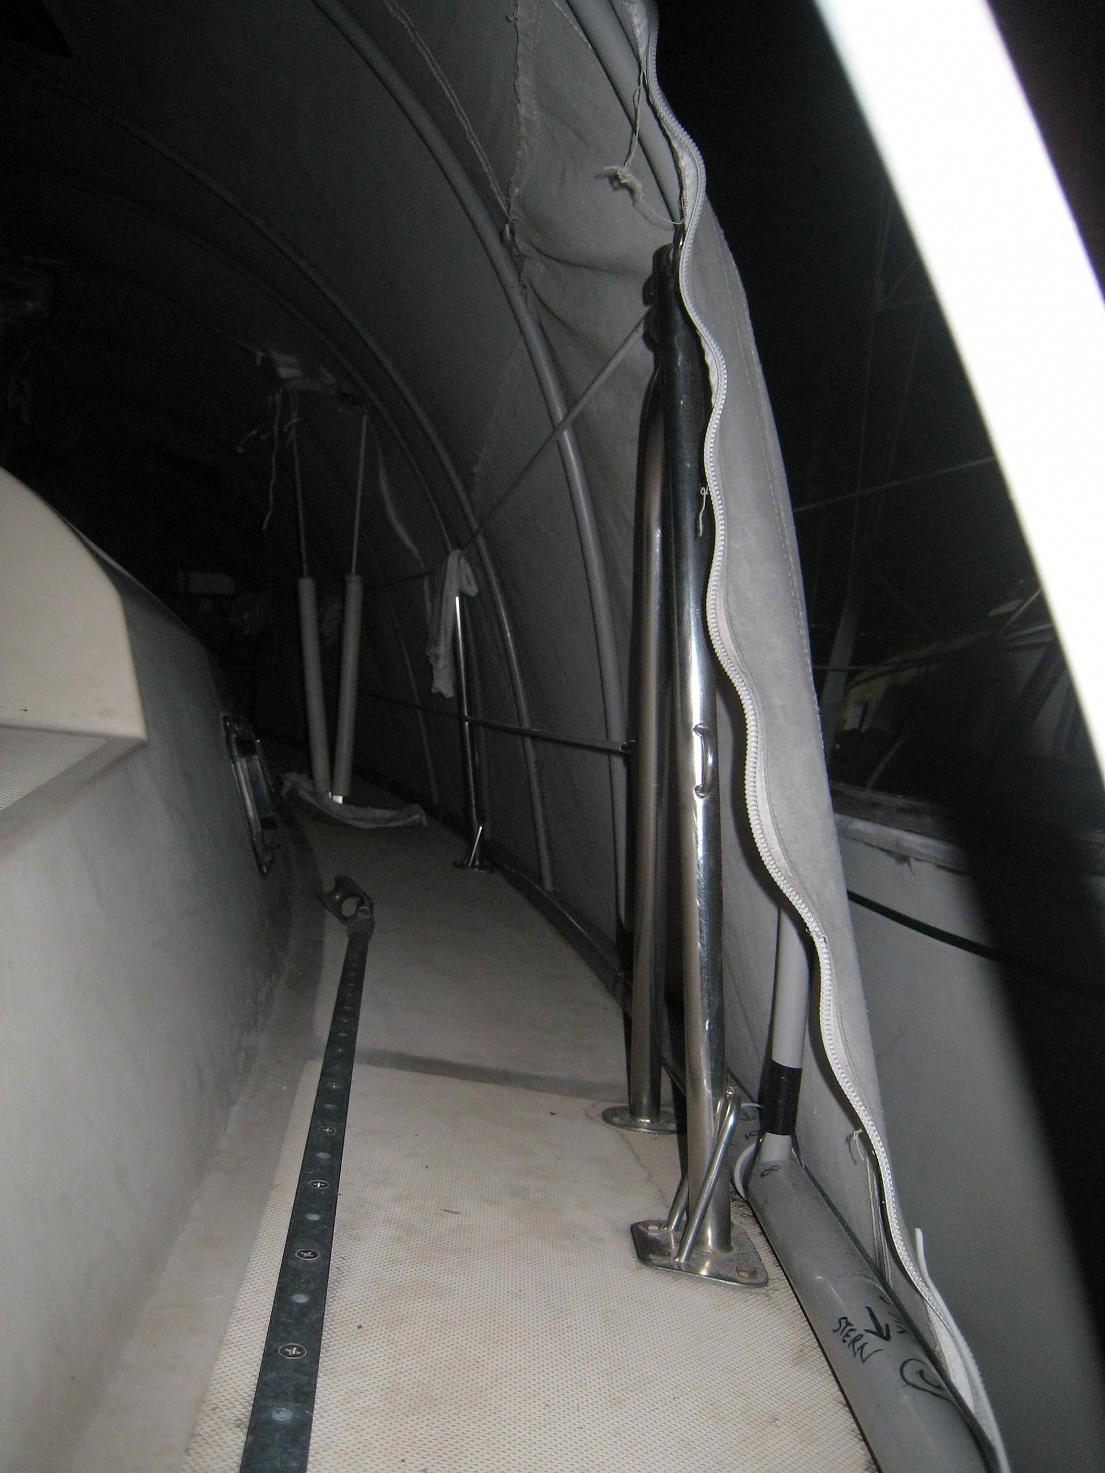 Click image for larger version  Name:Boat Frame 004.jpg Views:528 Size:485.5 KB ID:6756